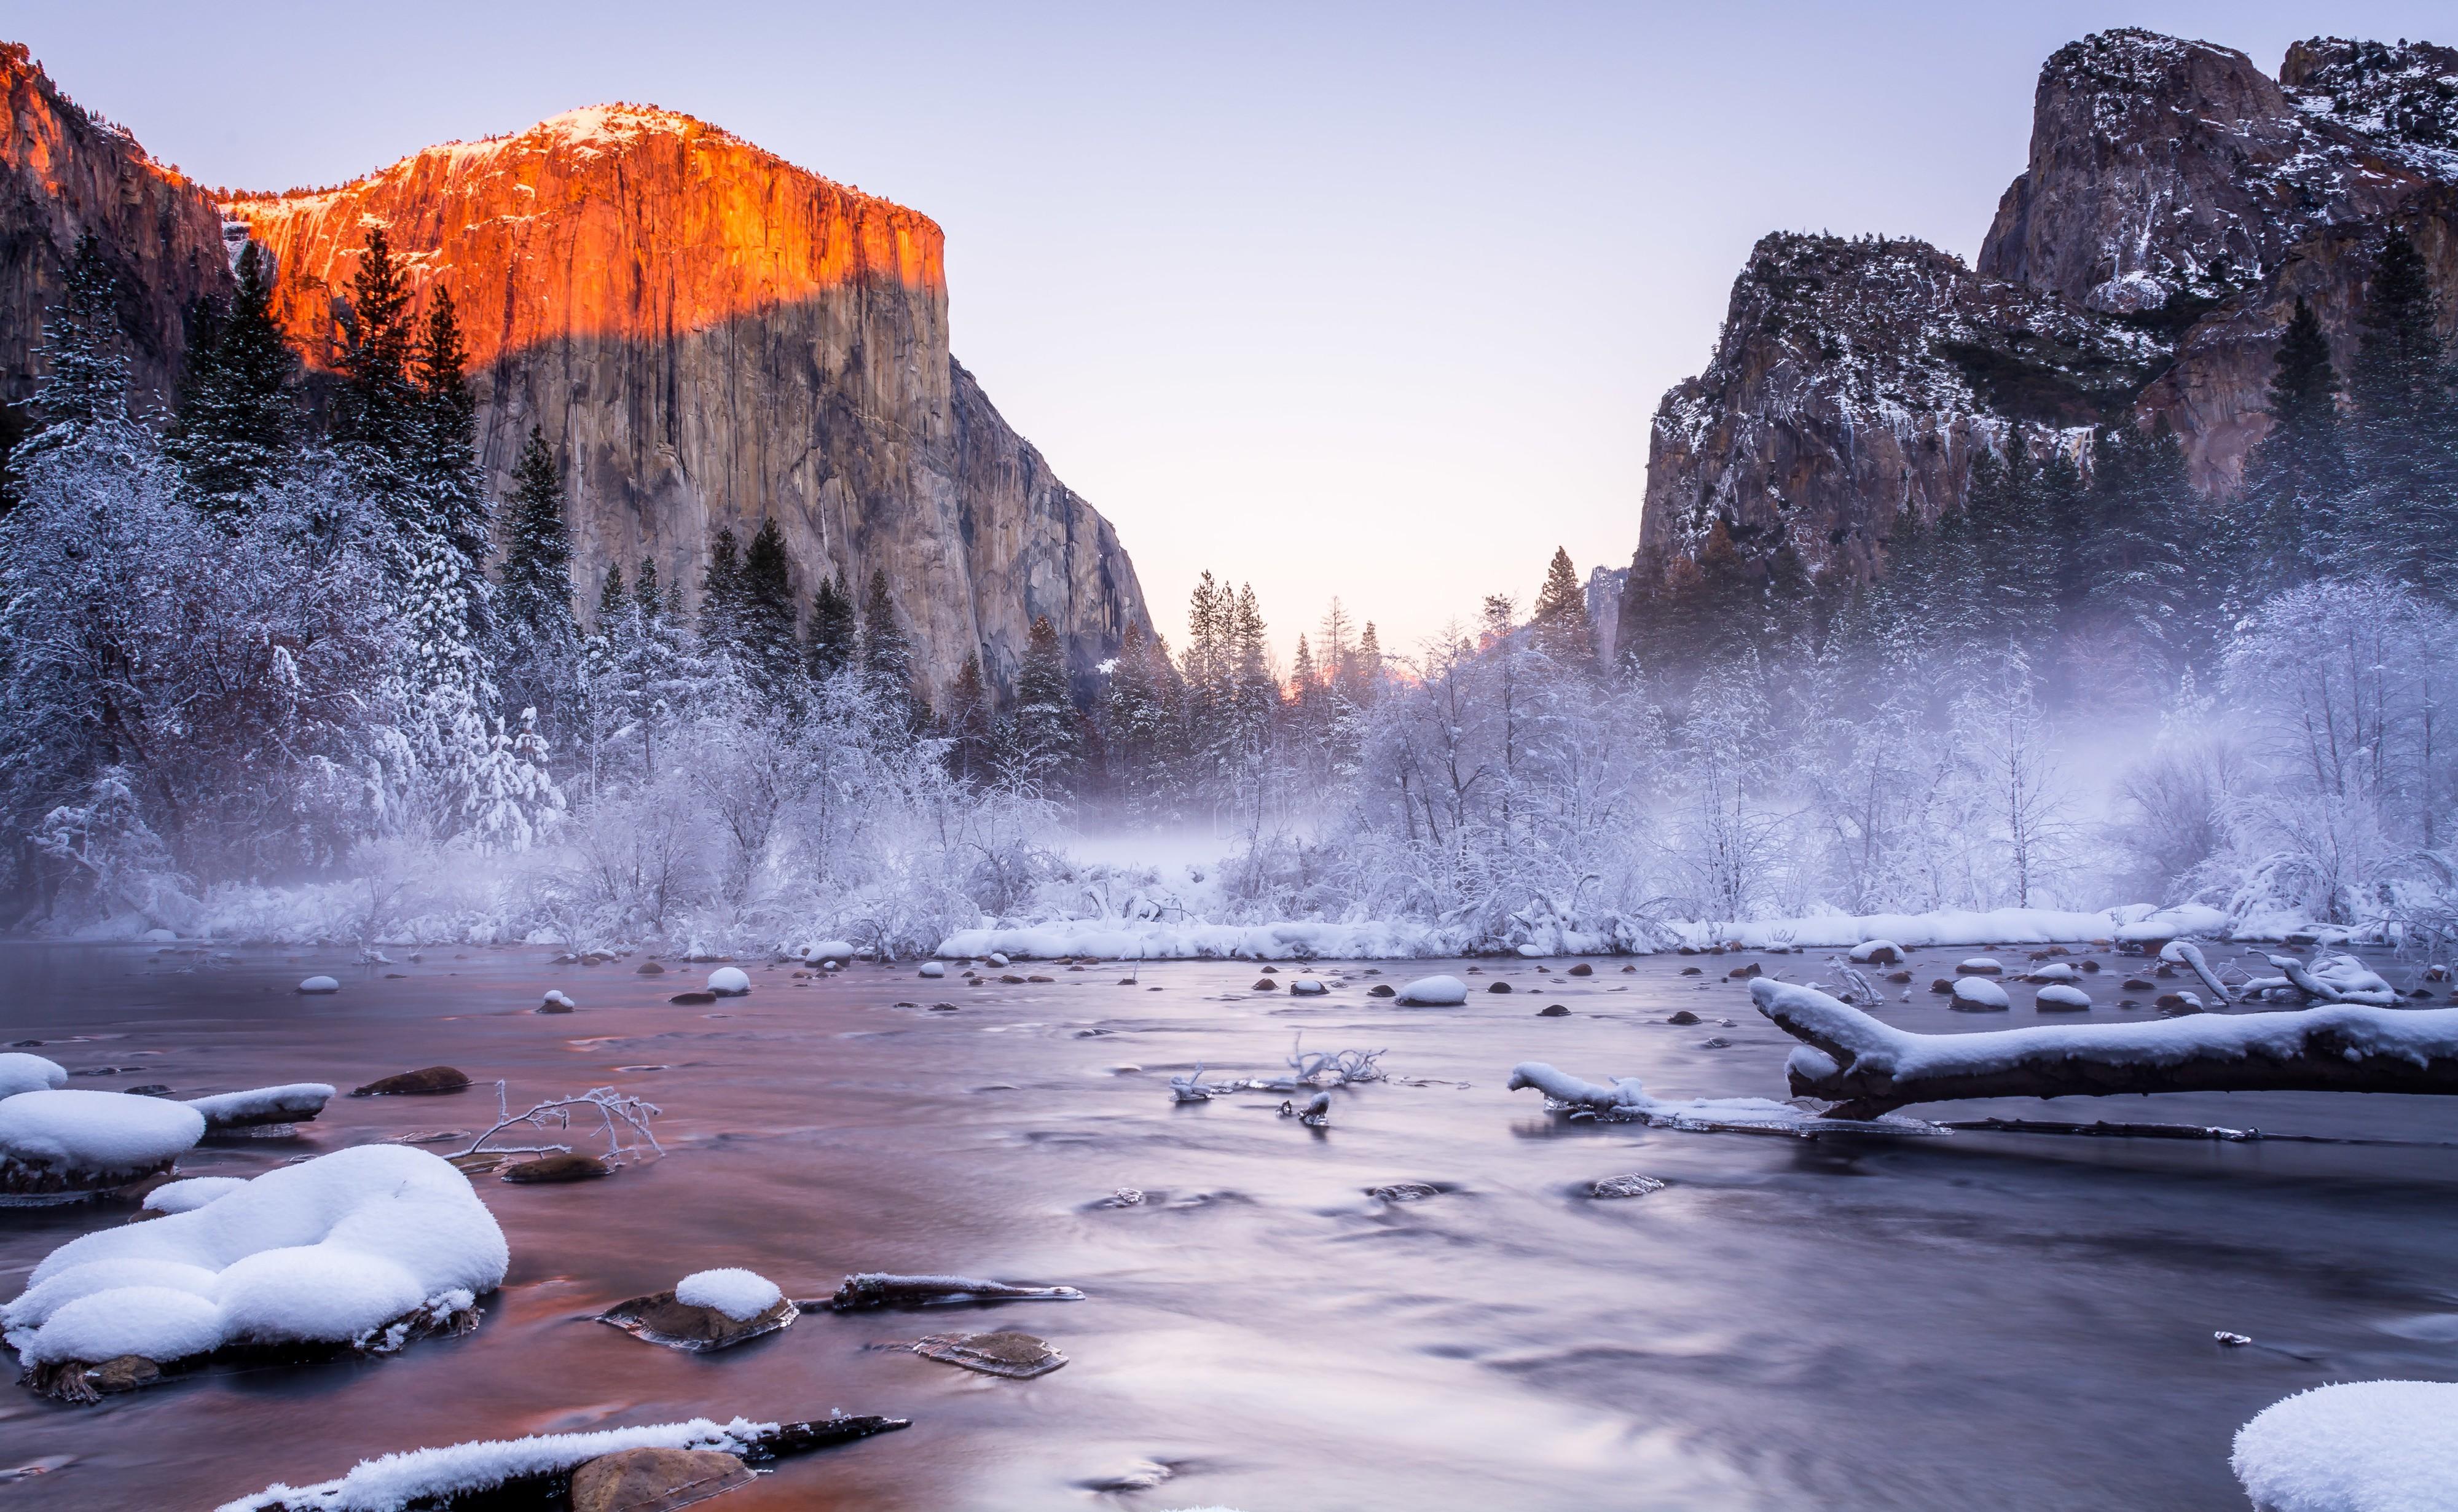 Wallpaper Yosemite 5k 4k Wallpaper National Park